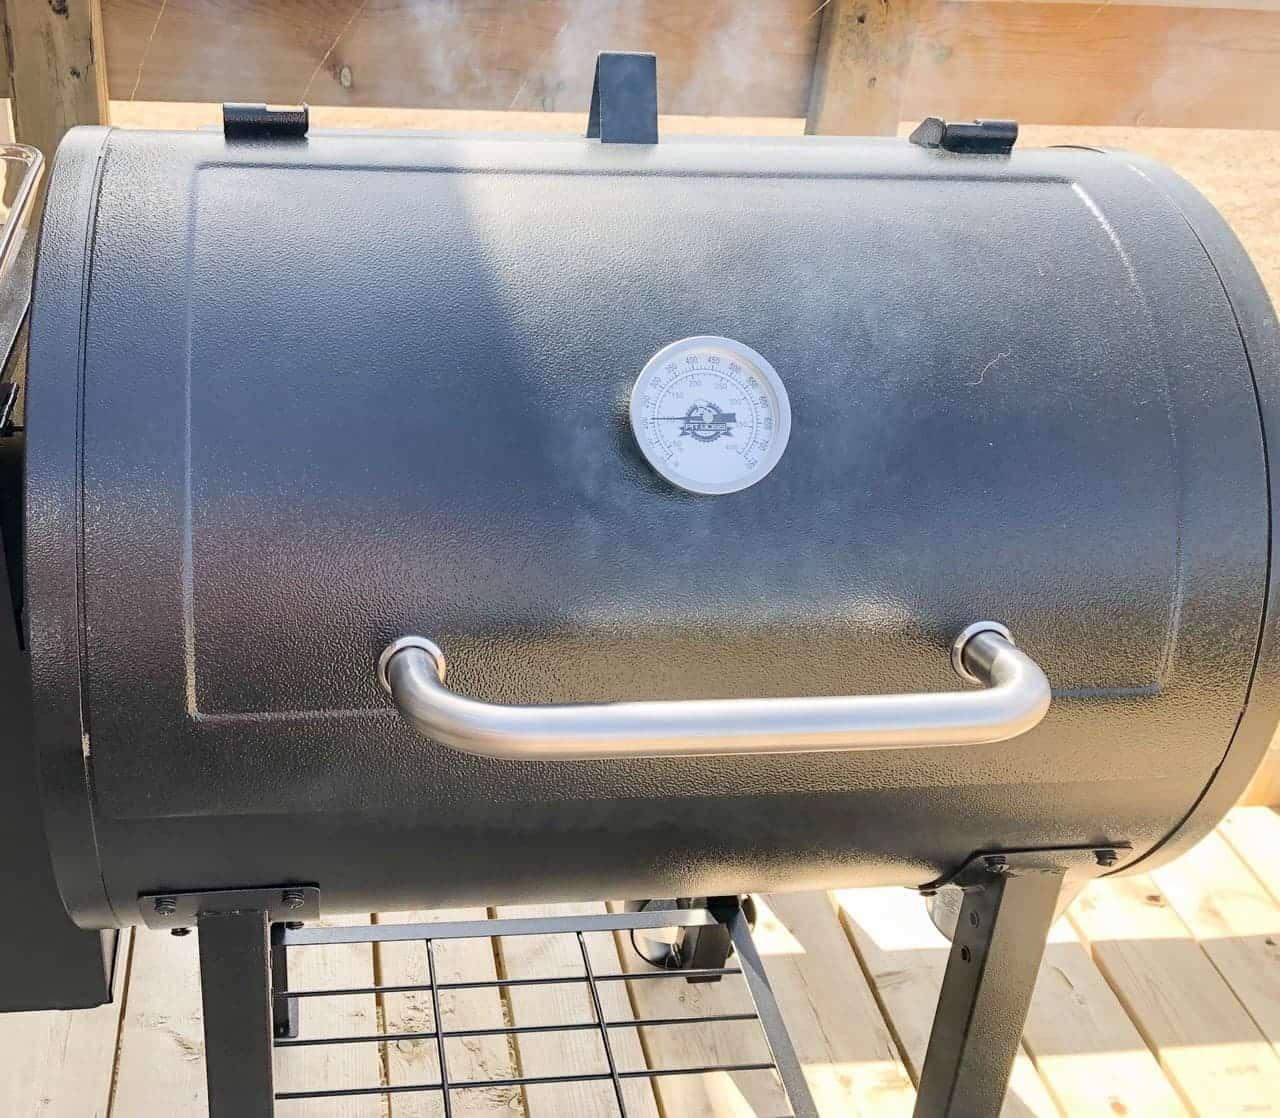 Pit Boss pellet grill smoking salmon